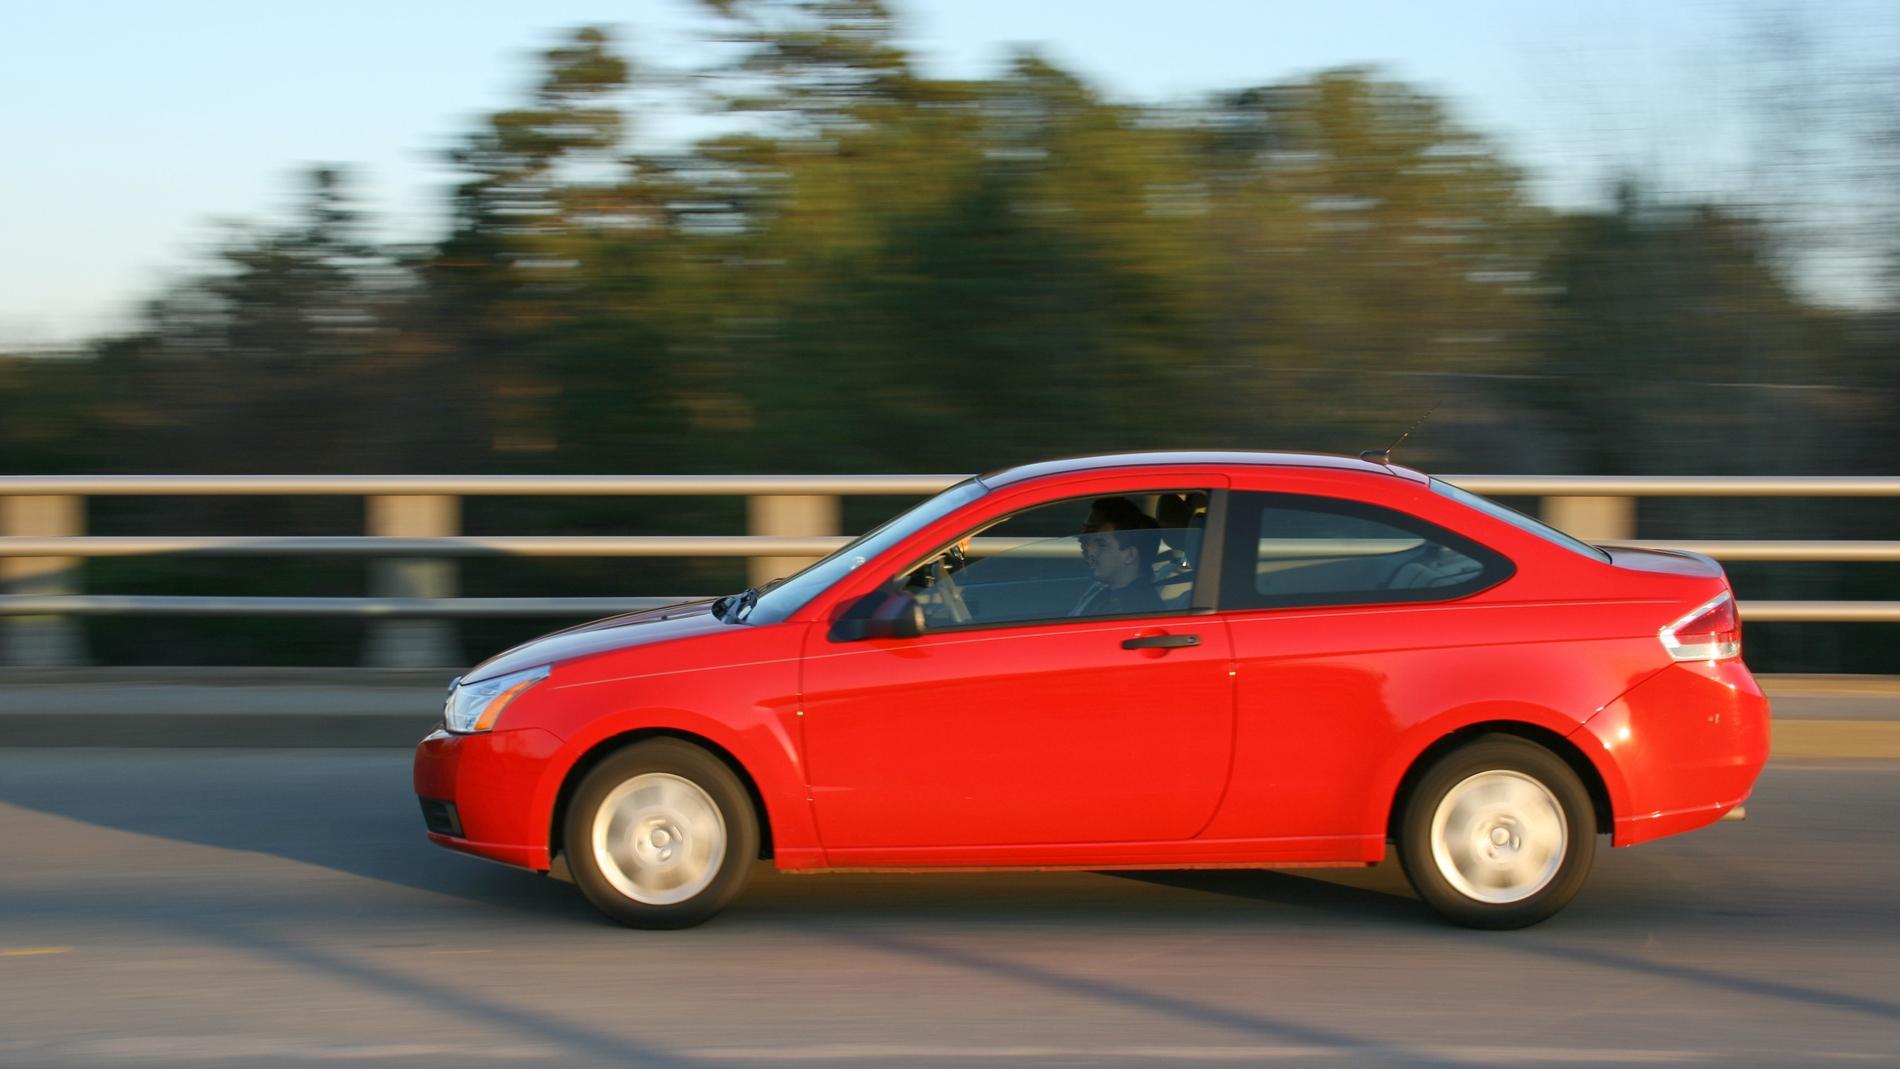 Un coche rojo circula por la carretera (